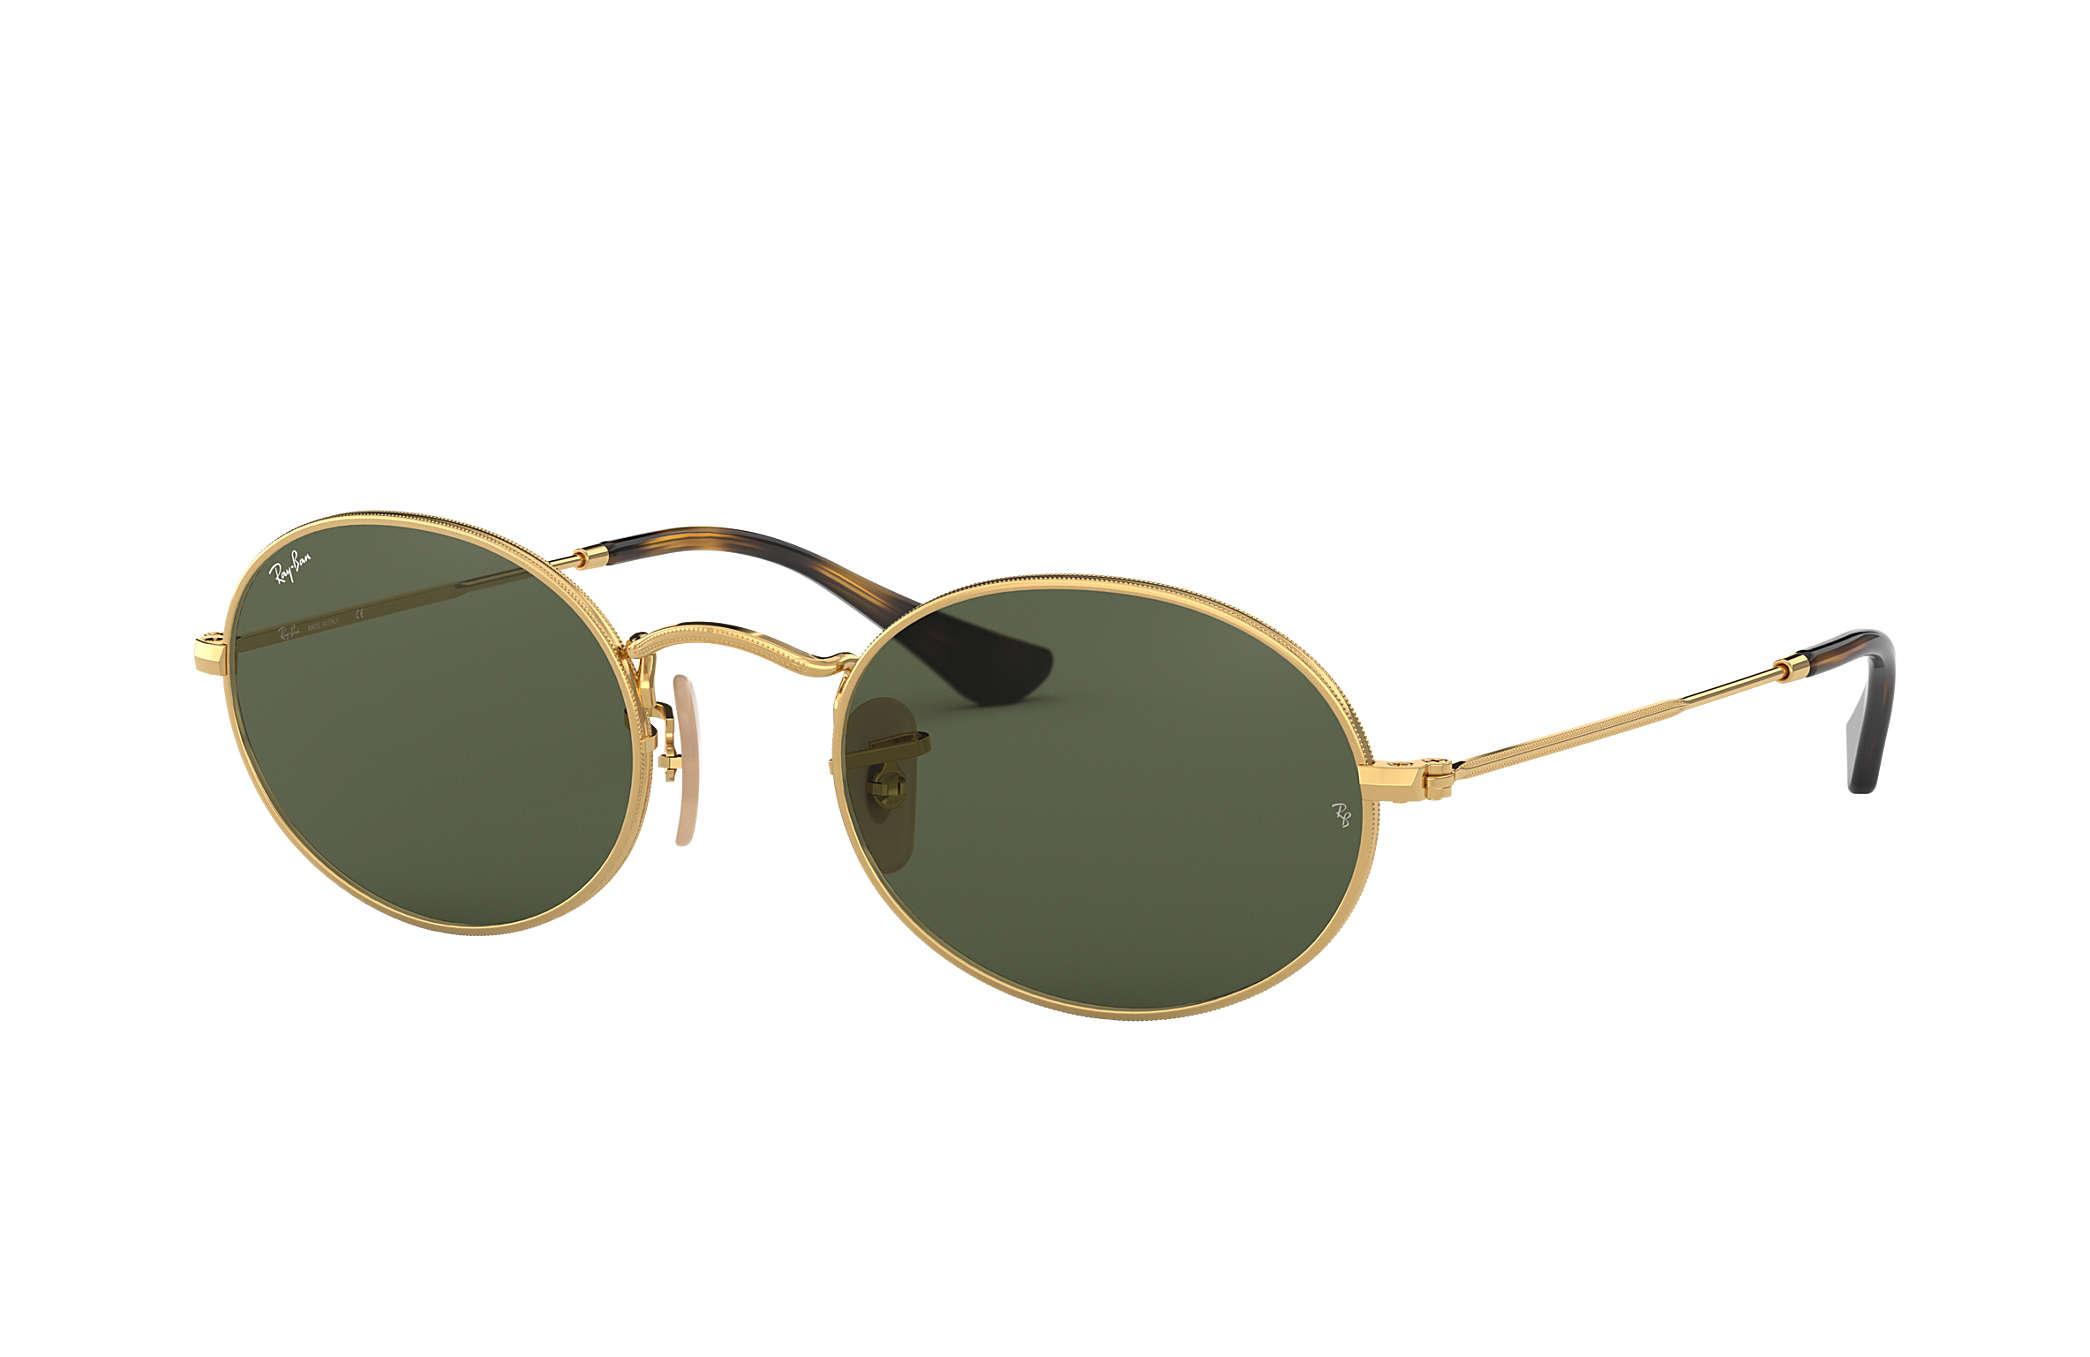 Ray-Ban Oval Flat Lenses RB3547N Oro - Metal - Lentes Verde ... 31282c88f7